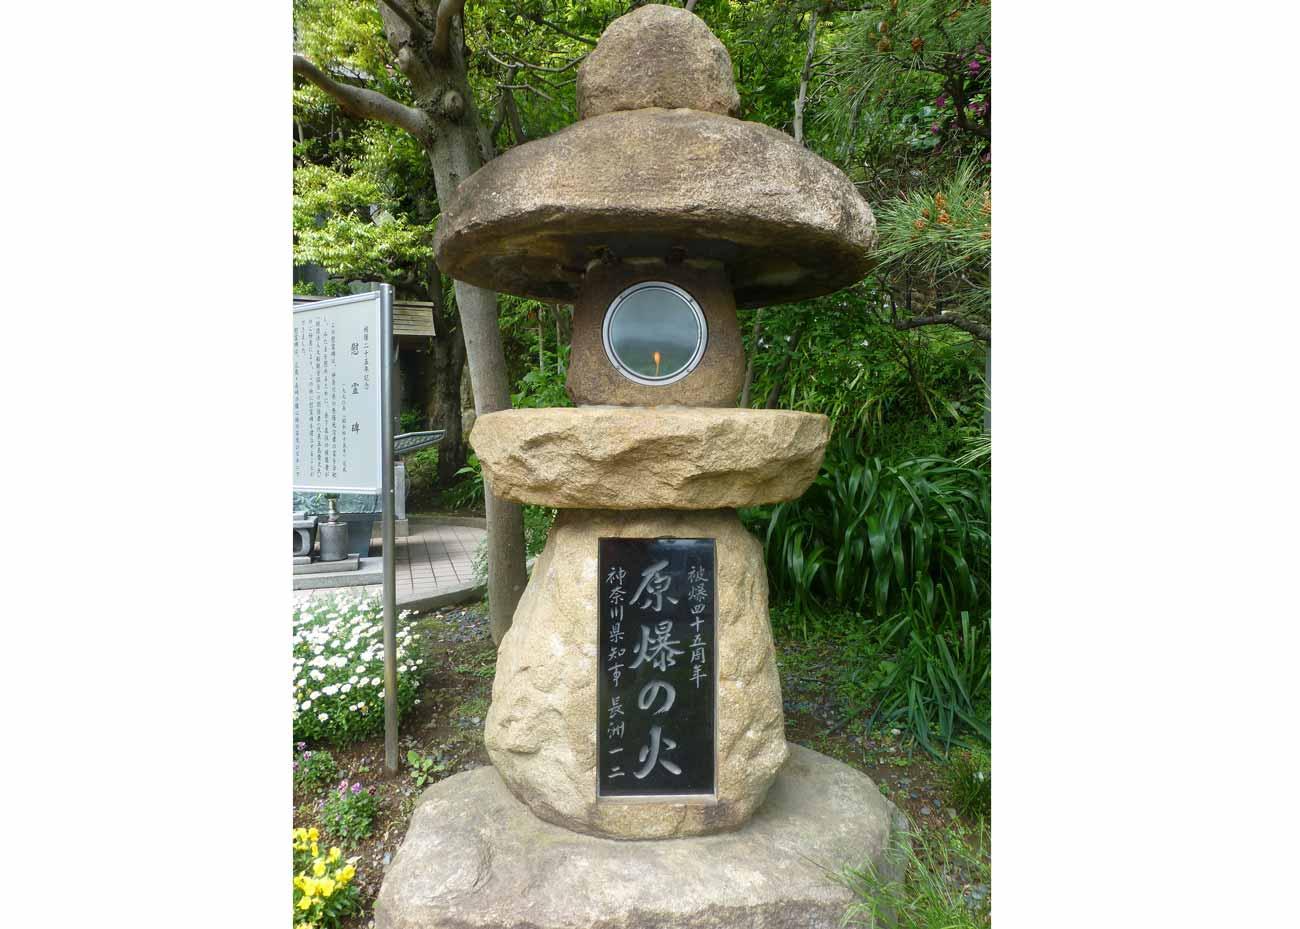 ©    Ik T  /  Creative Commons , Ofuna Atomic Bomb Cenotaph